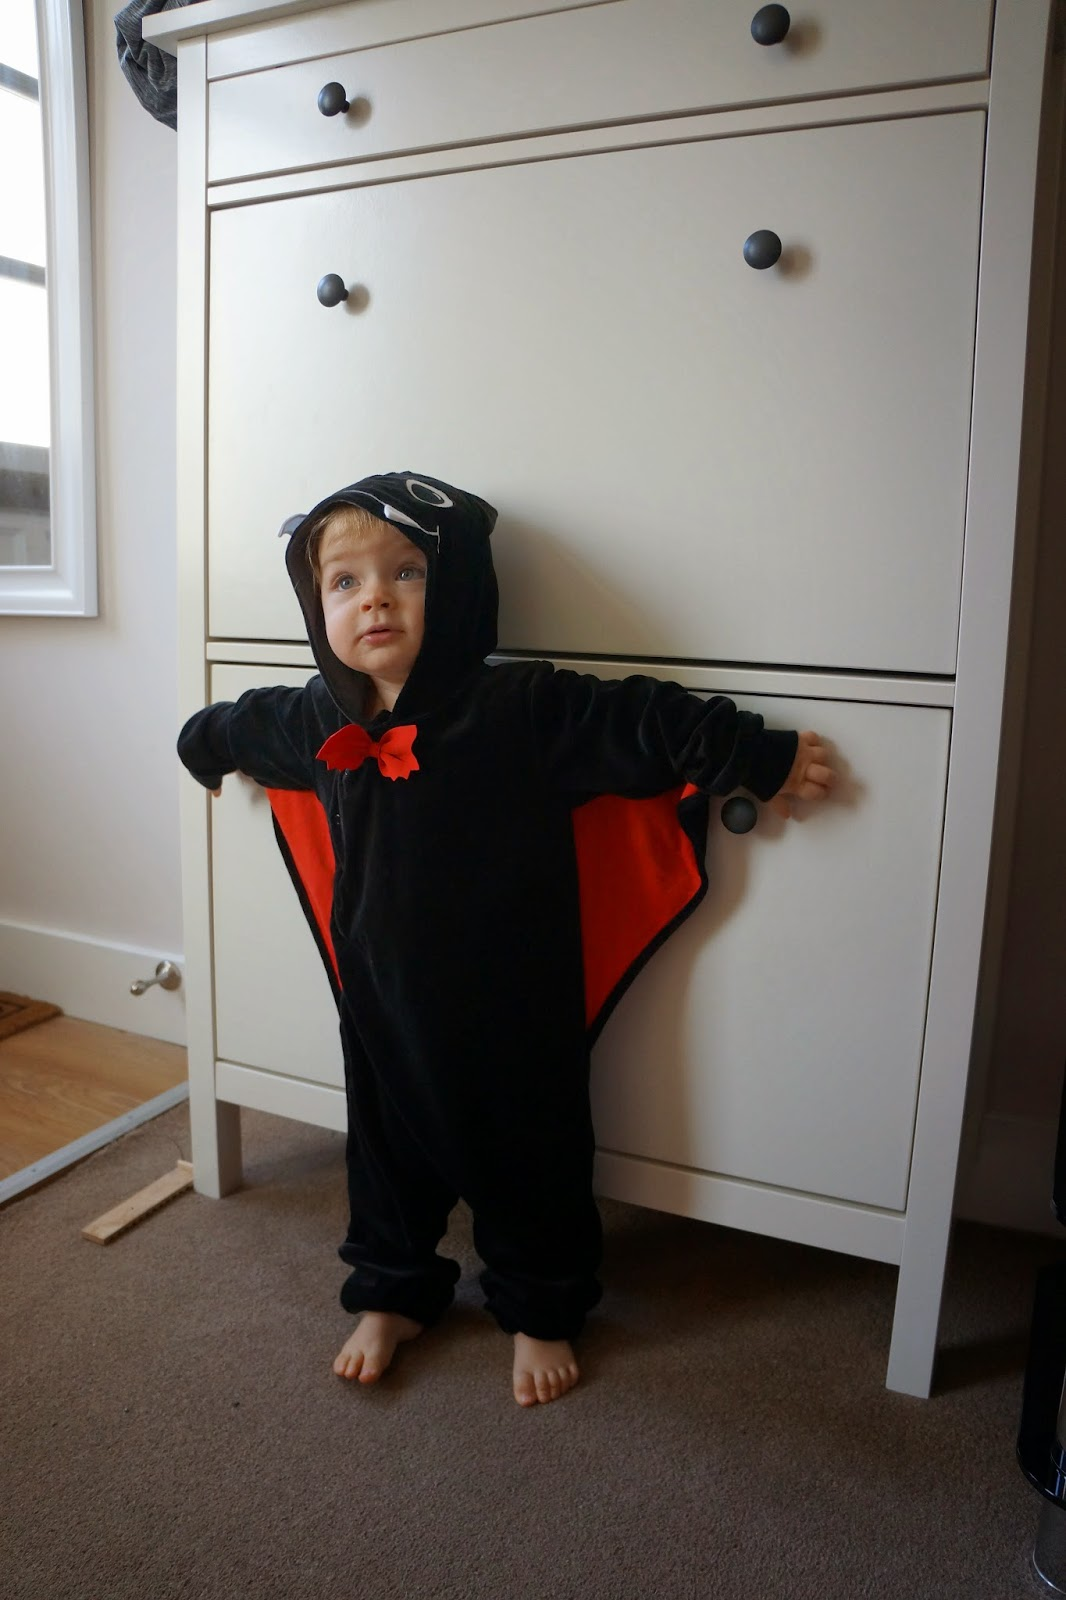 baby bat halloween costume H&M